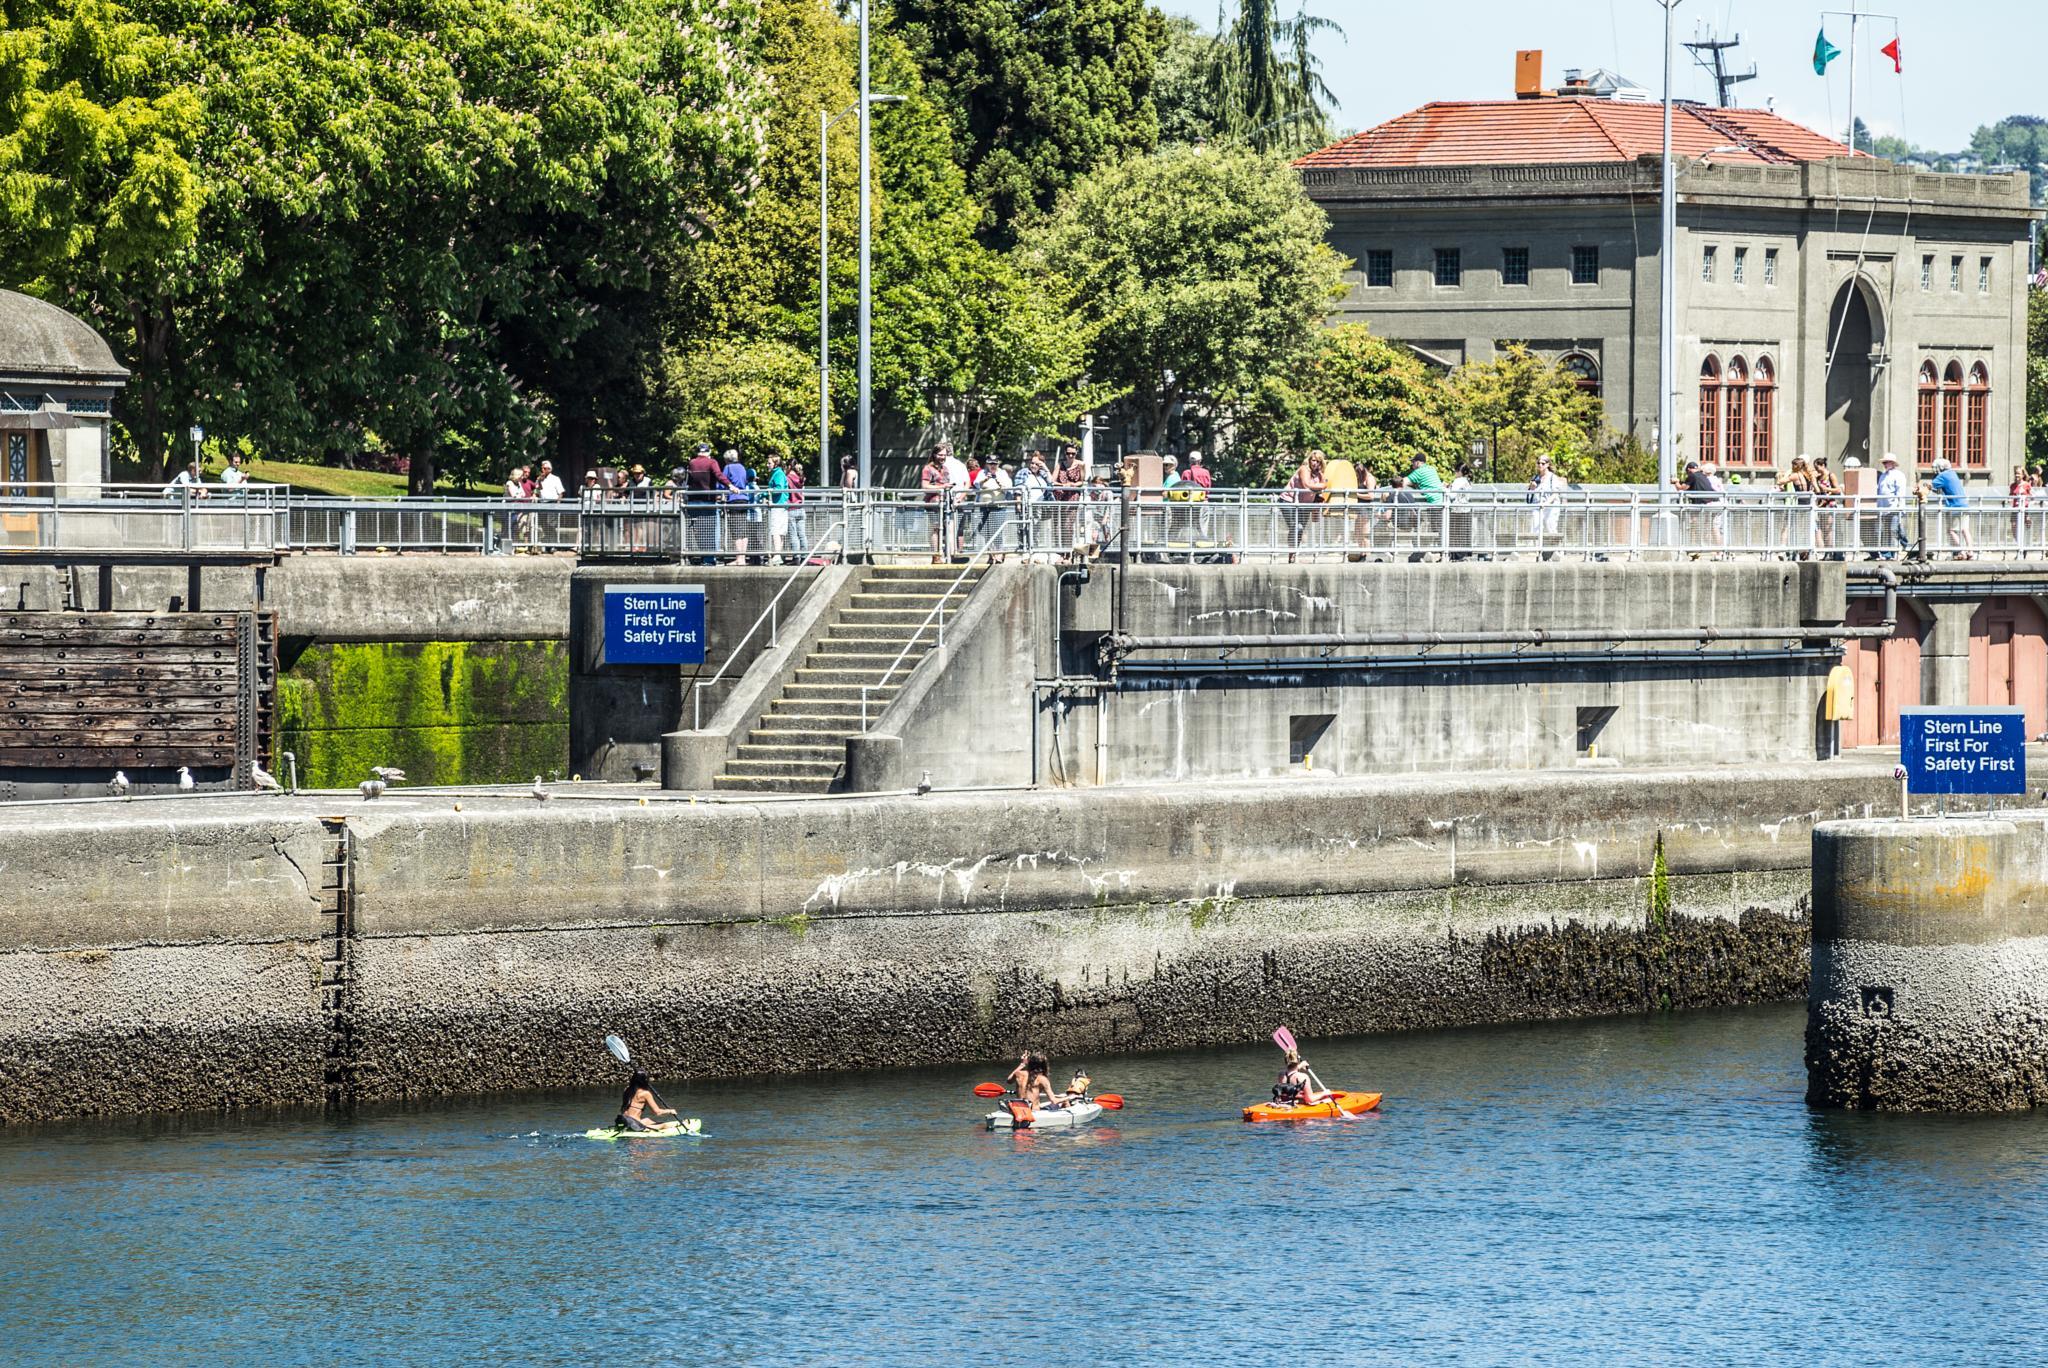 Kayaks going through the Ballard Locks by Stephen C. Benine